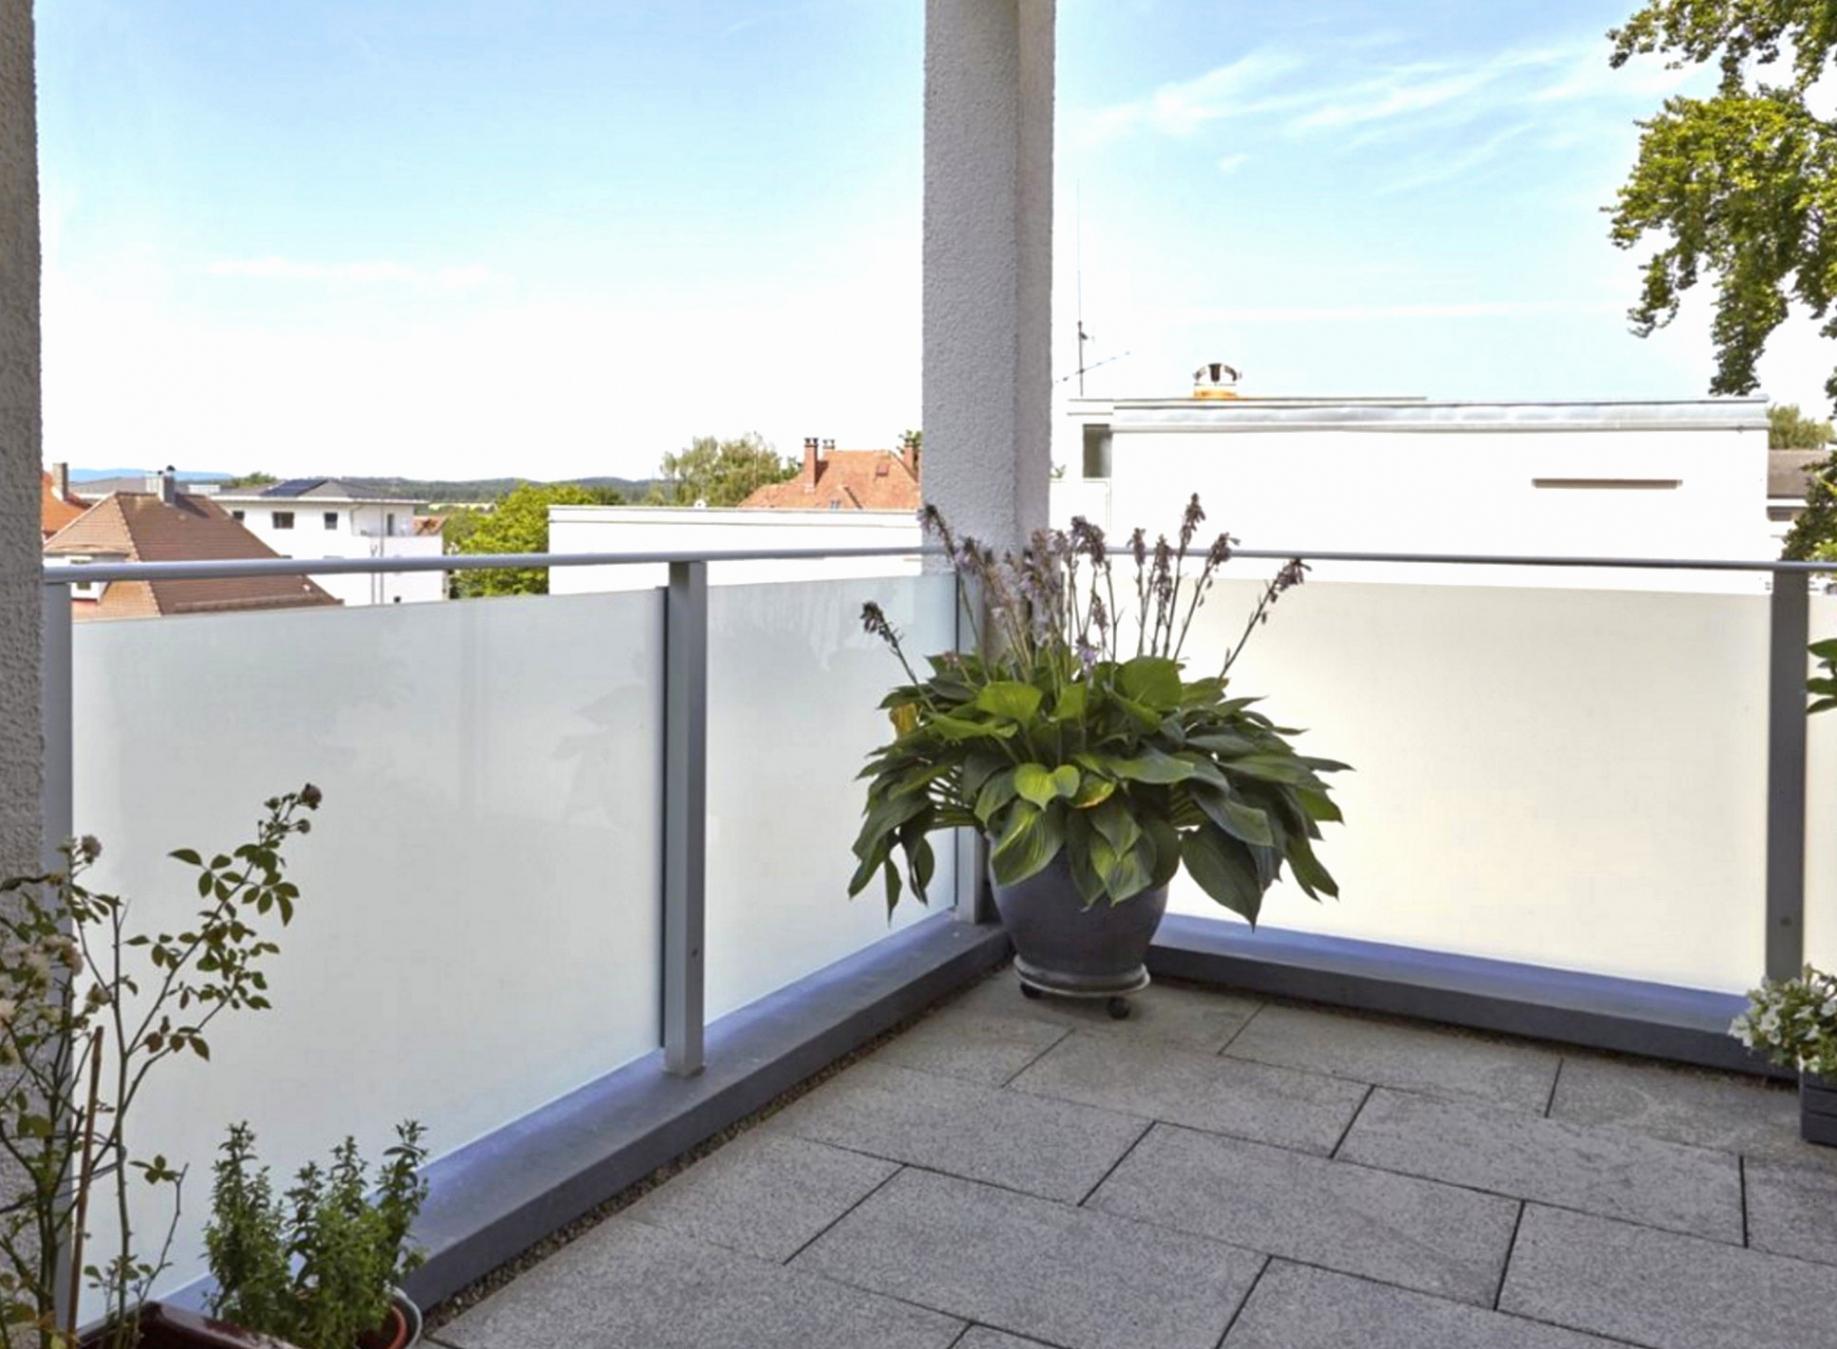 Balkon Deko Selber Machen Inspirierend Gartendeko Selber Machen — Temobardz Home Blog